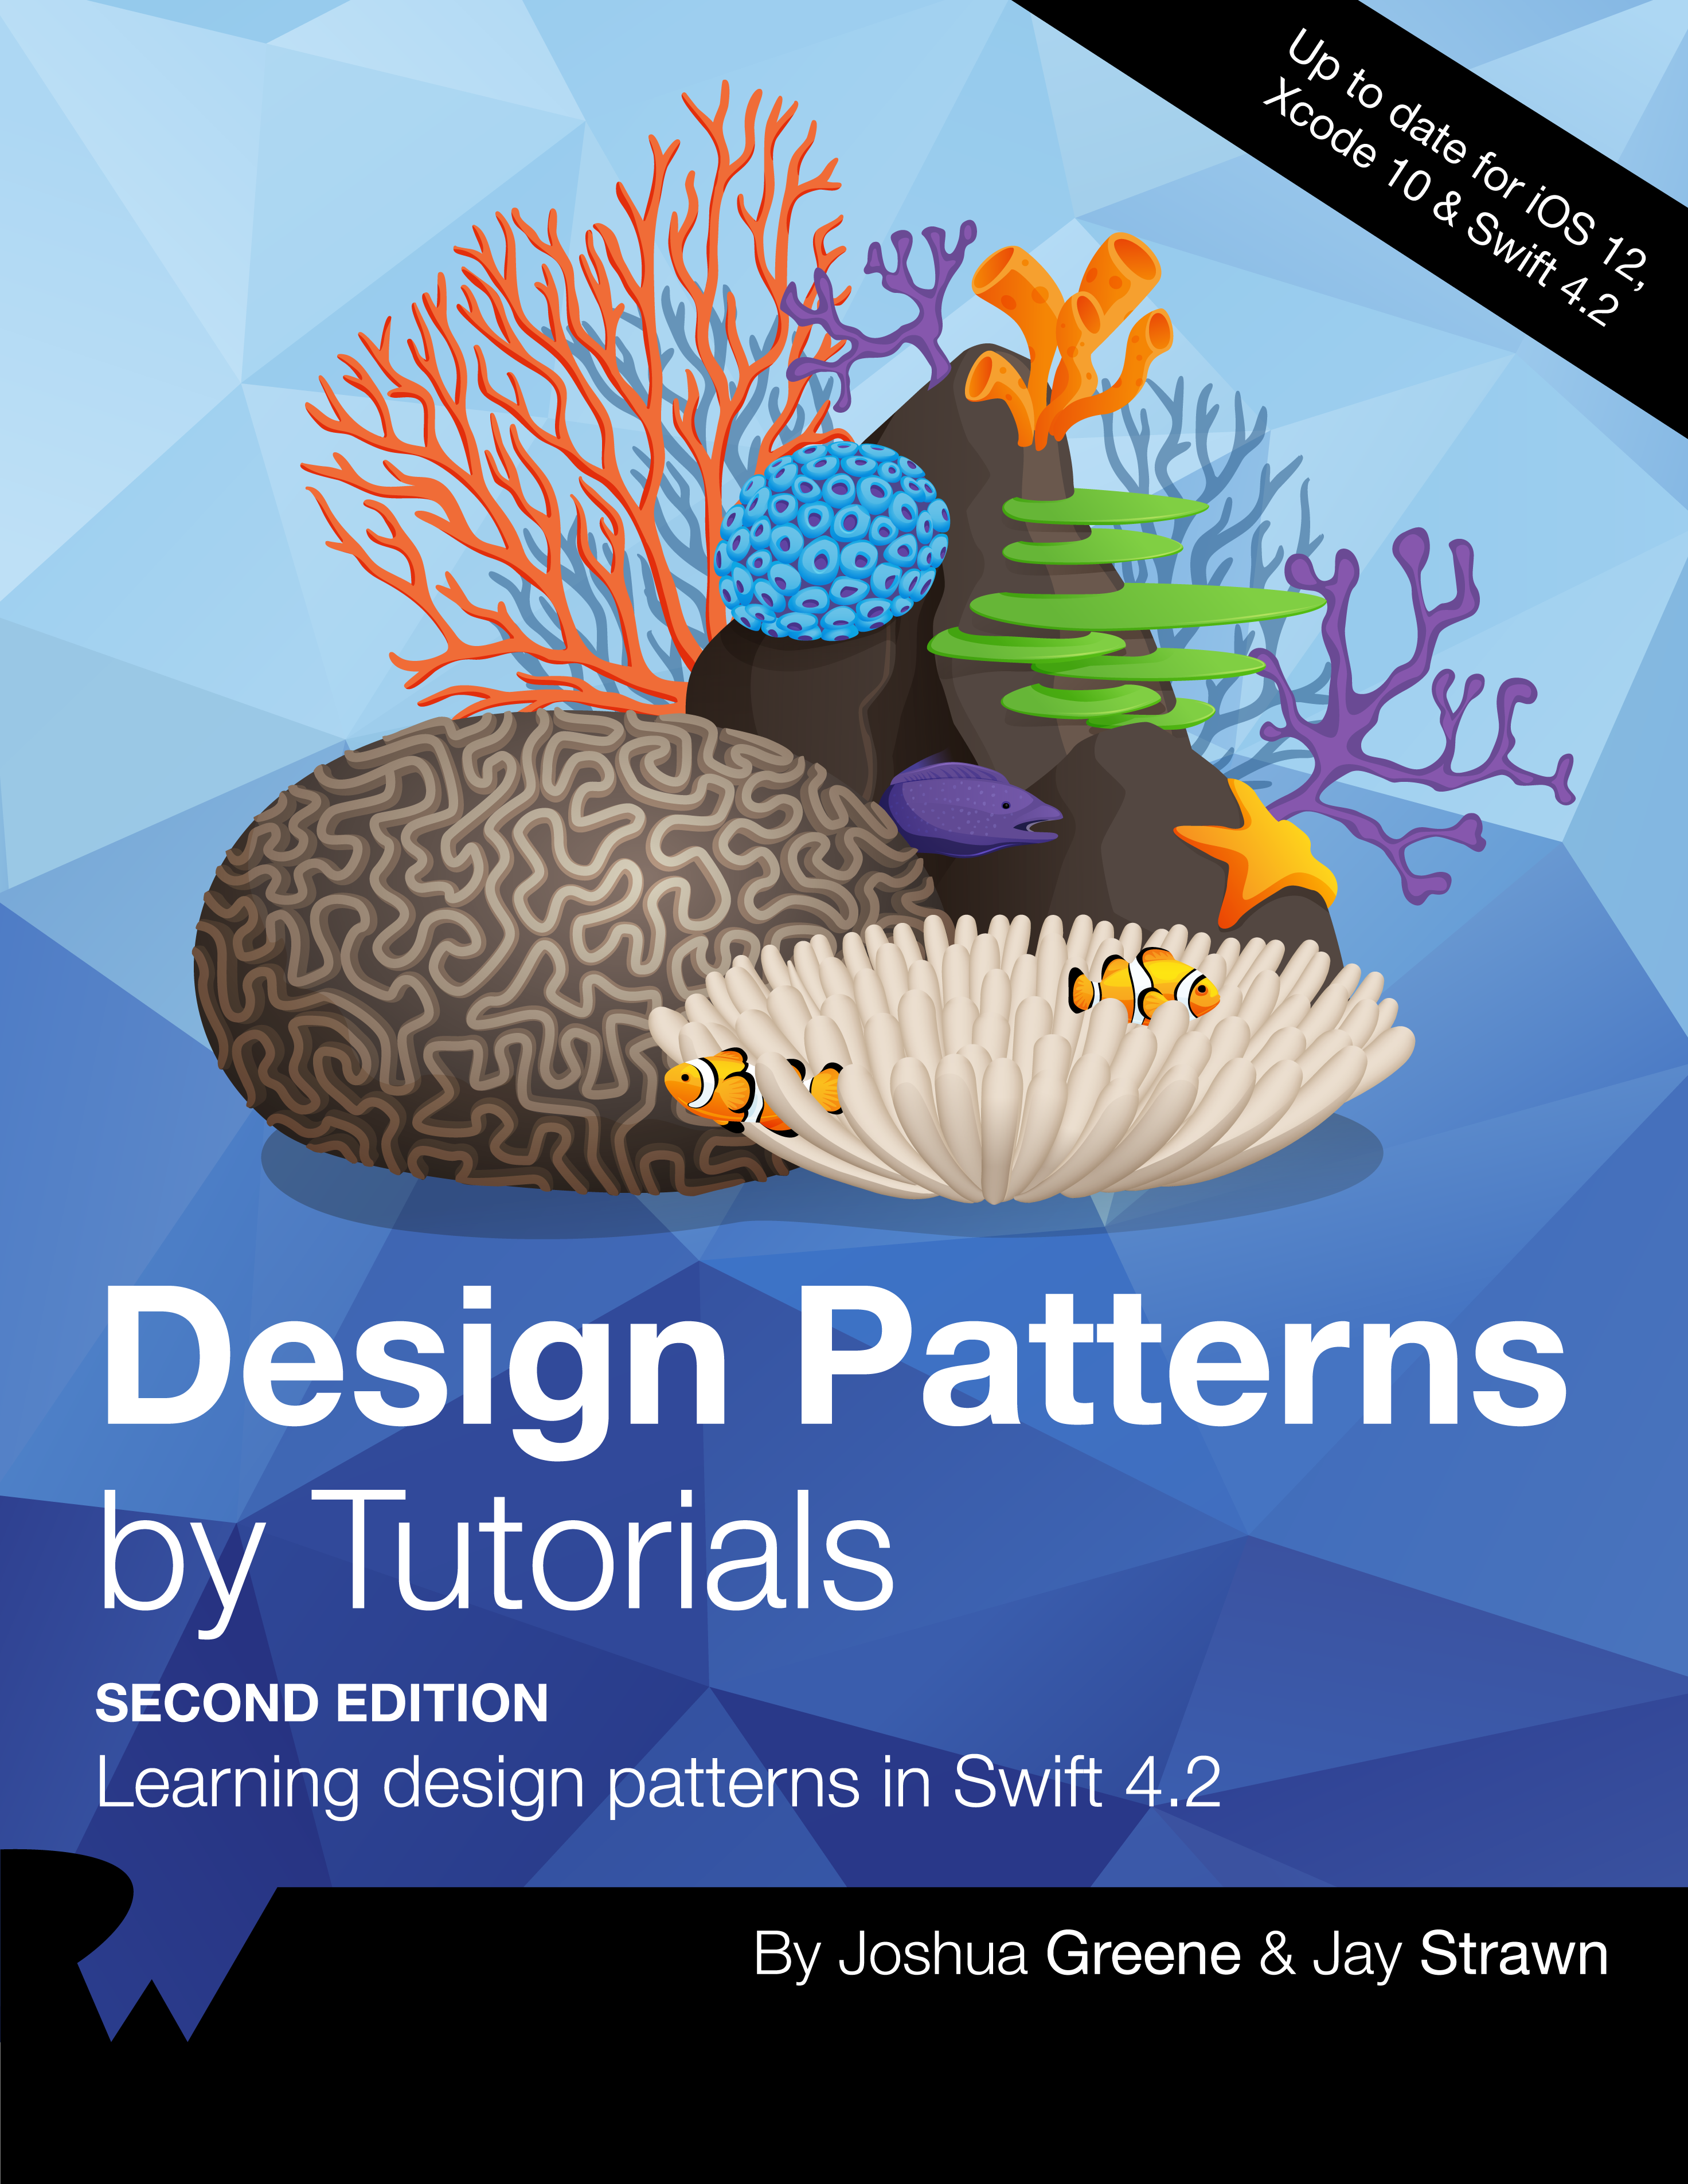 Gang Of 4 Design Patterns Amazing Design Ideas